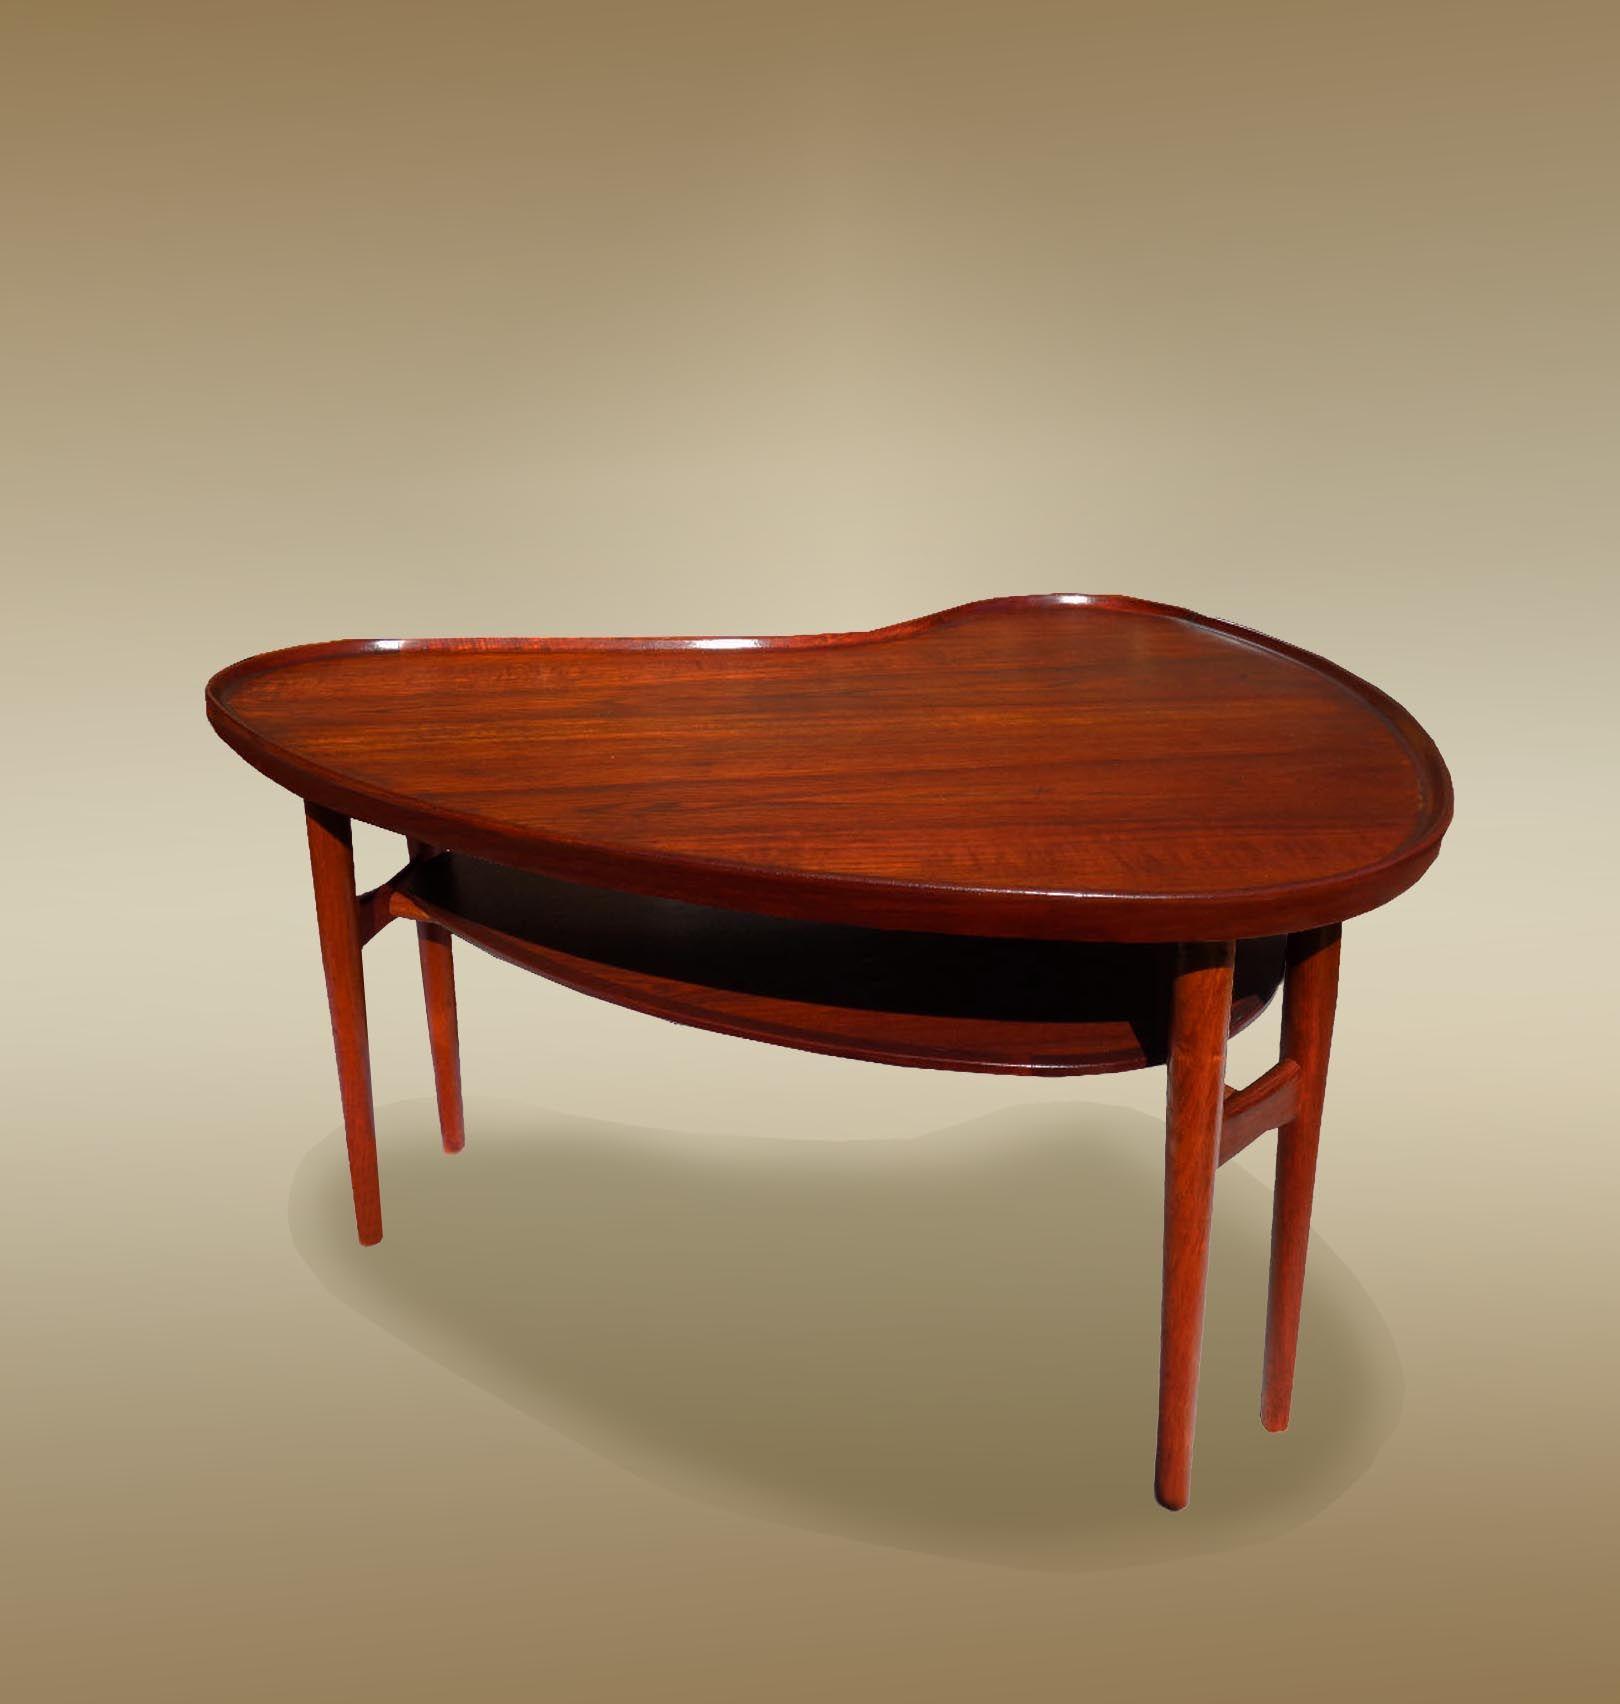 kidney shape rosewood teak coffee table sold